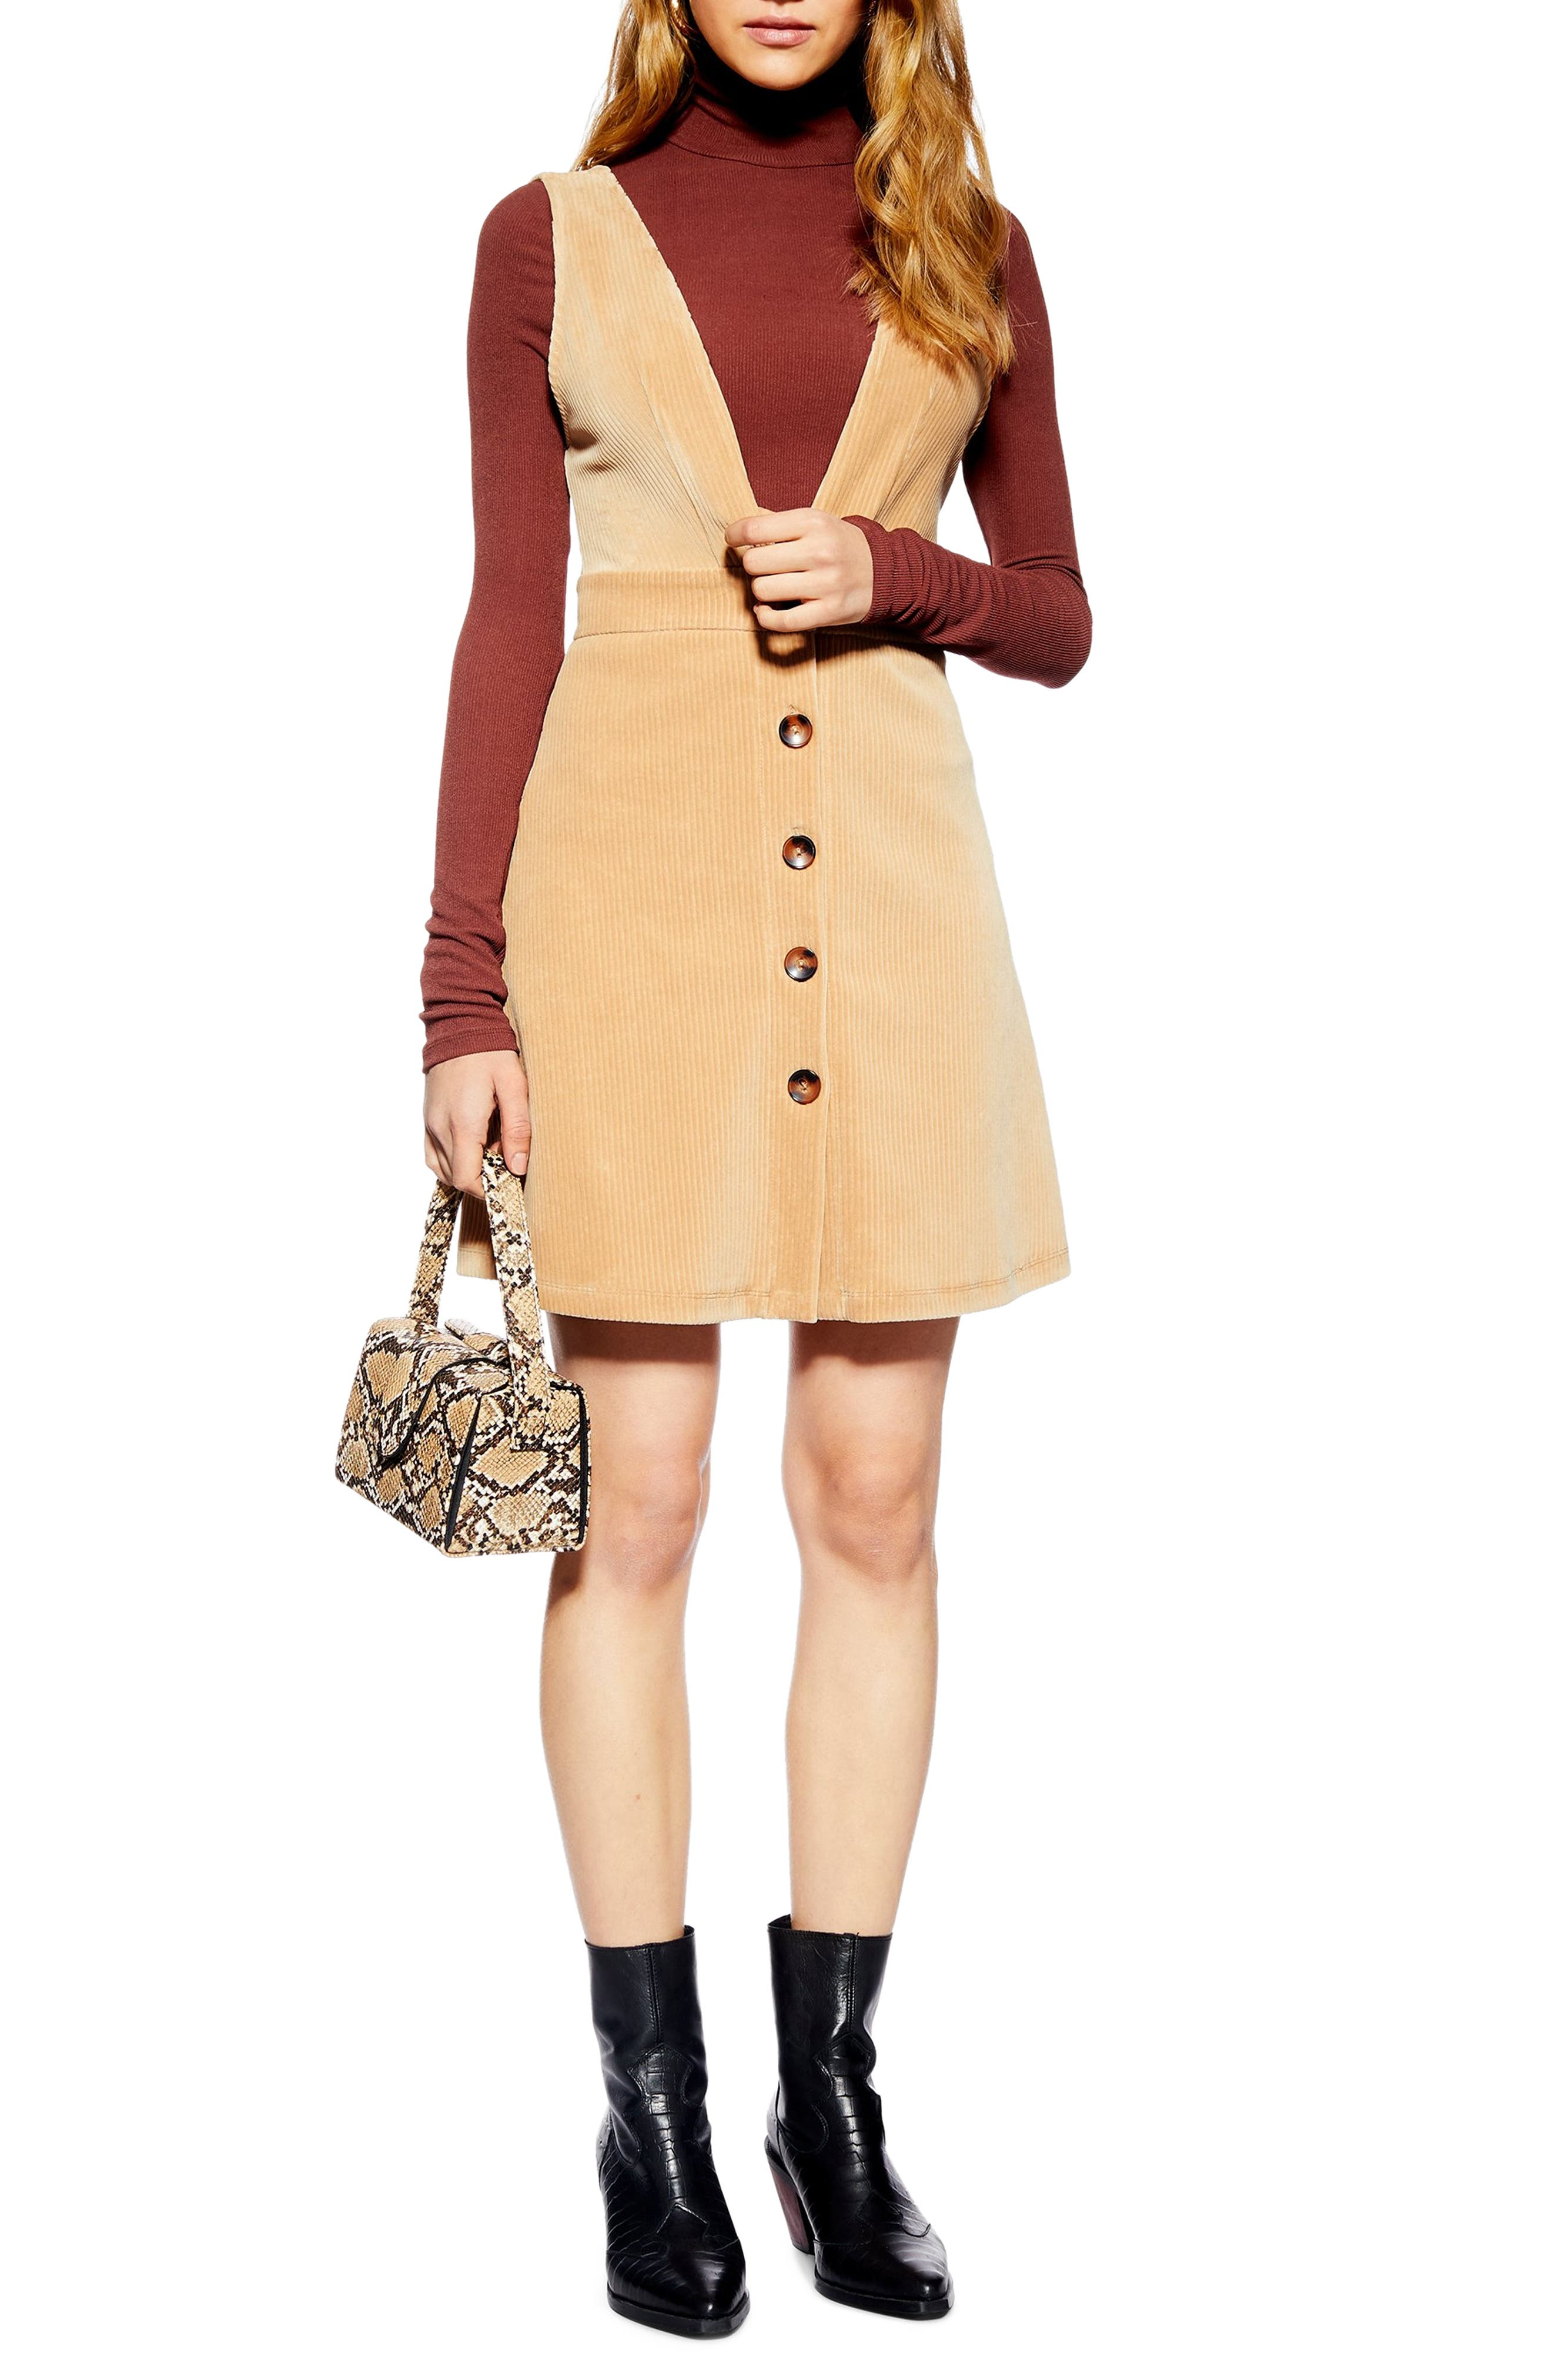 Topshop Corduroy Pinafore Dress, US (fits like 14) - Beige